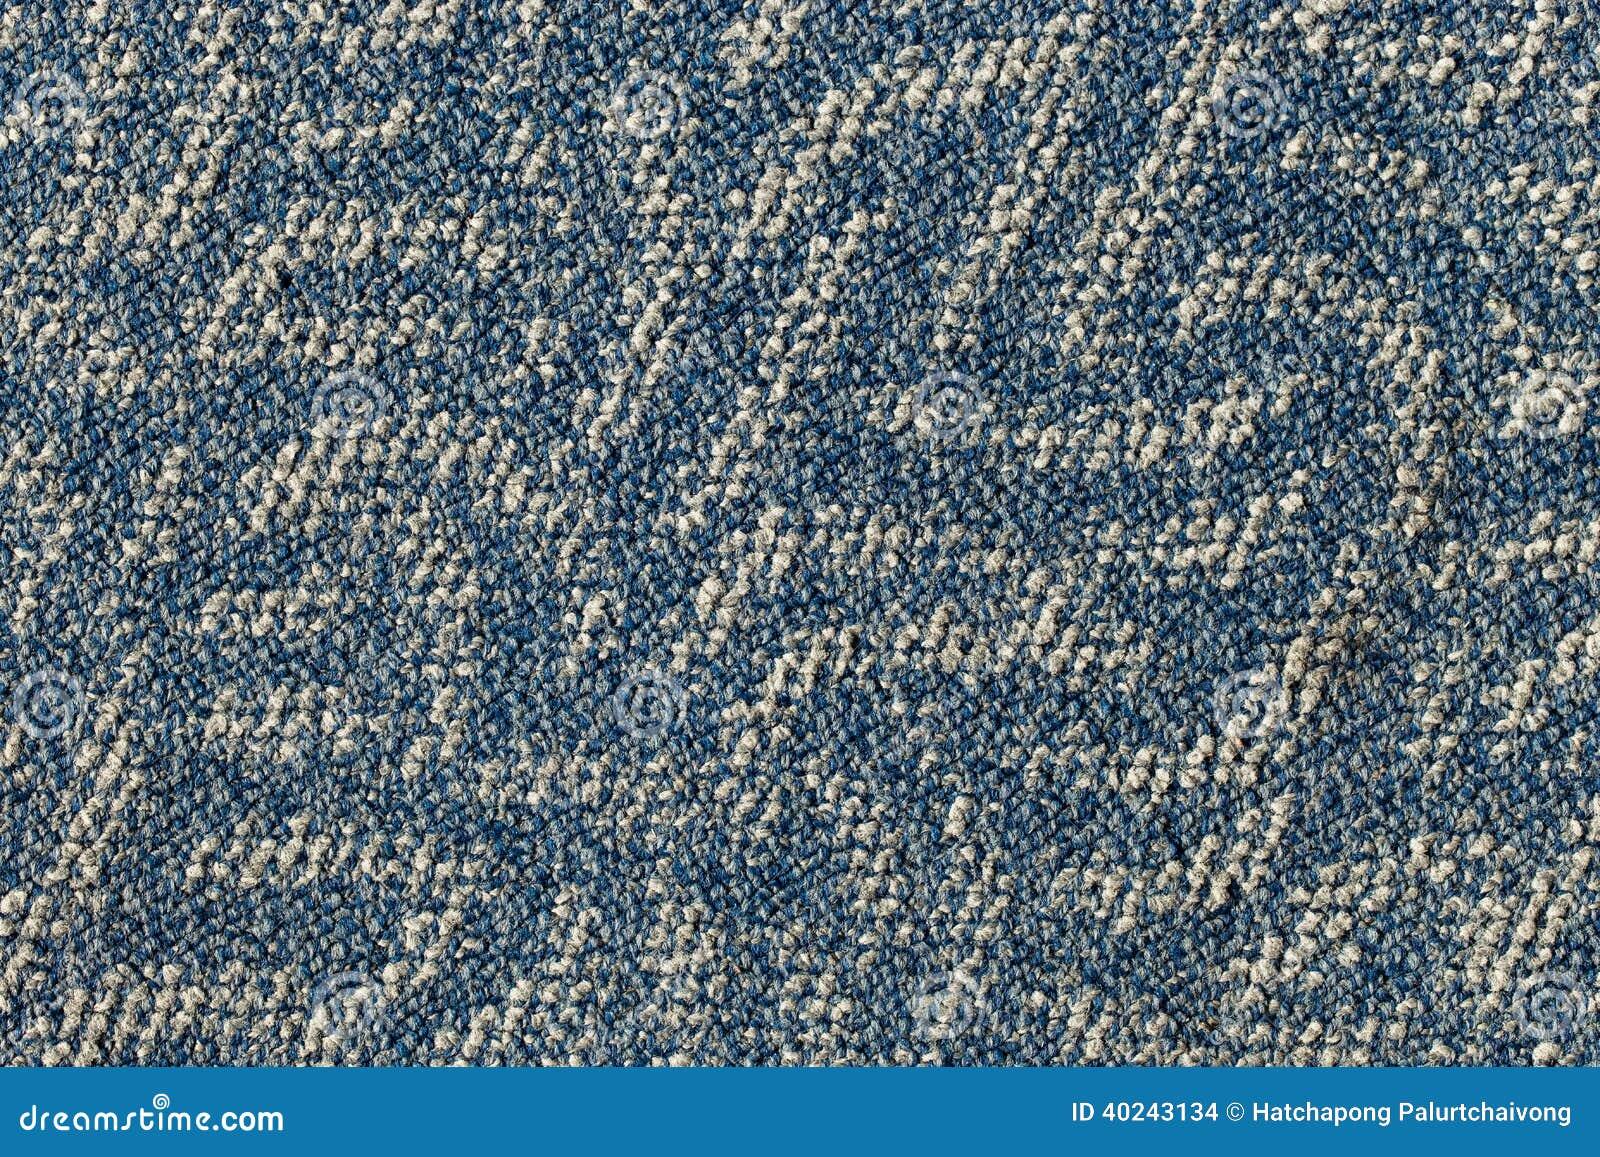 background carpet floor texture